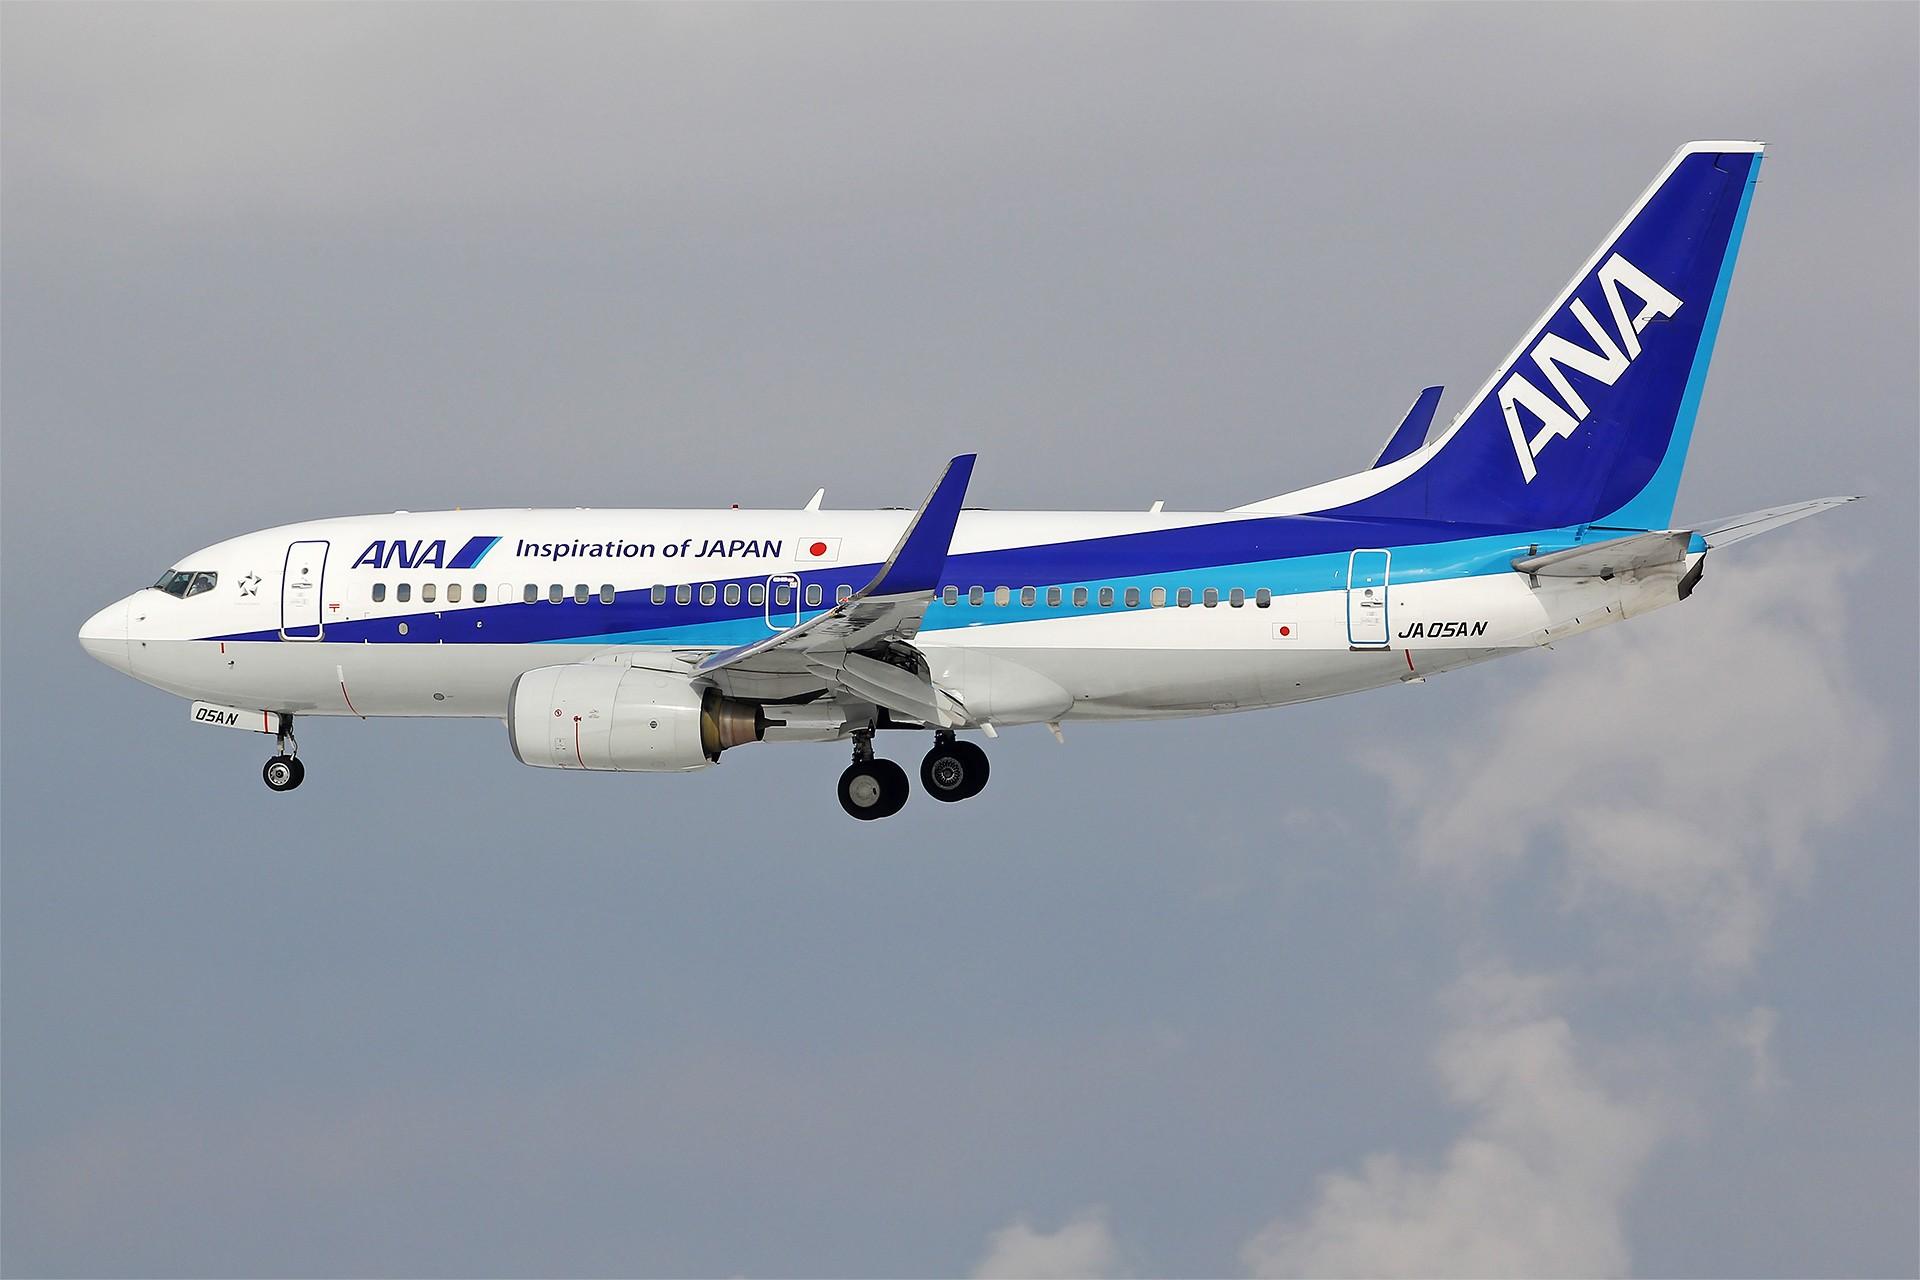 Re:[原创][DLC]。。。醉美日本。。。 BOEING 737-700 JA05AN 中国大连国际机场